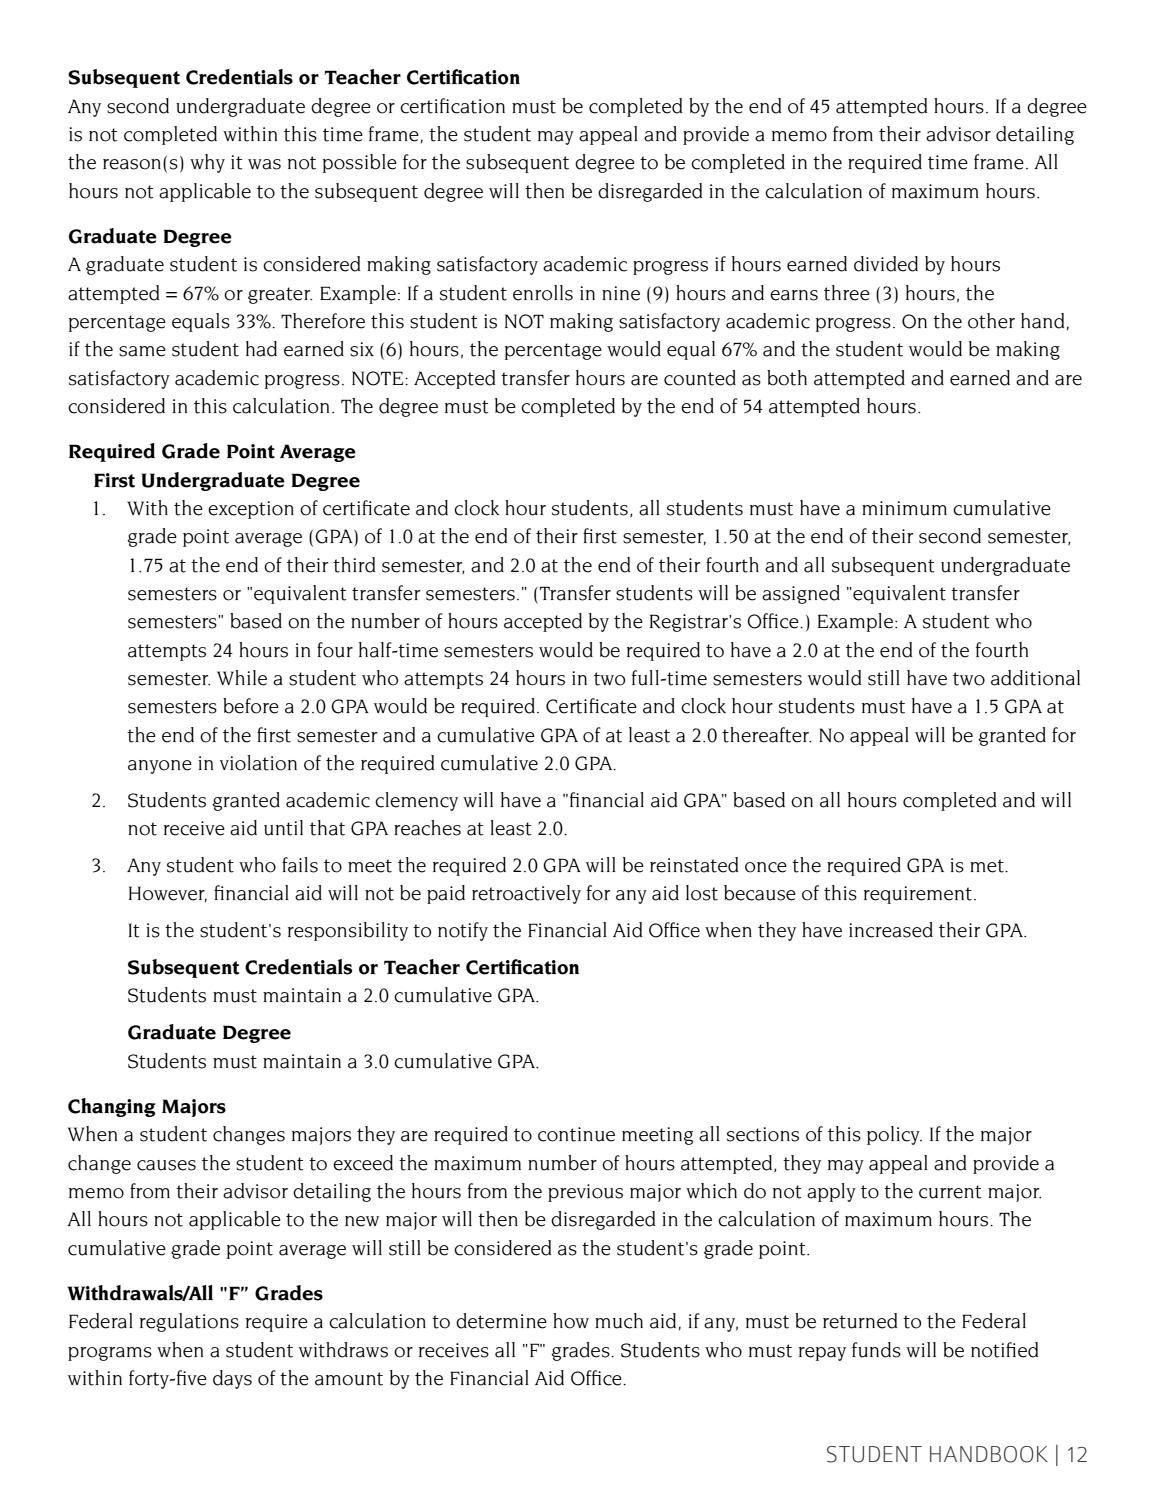 Gpa Calculator Cameron University Student Handbook 2016 By Arkansas Tech  University (page 17) Issuu